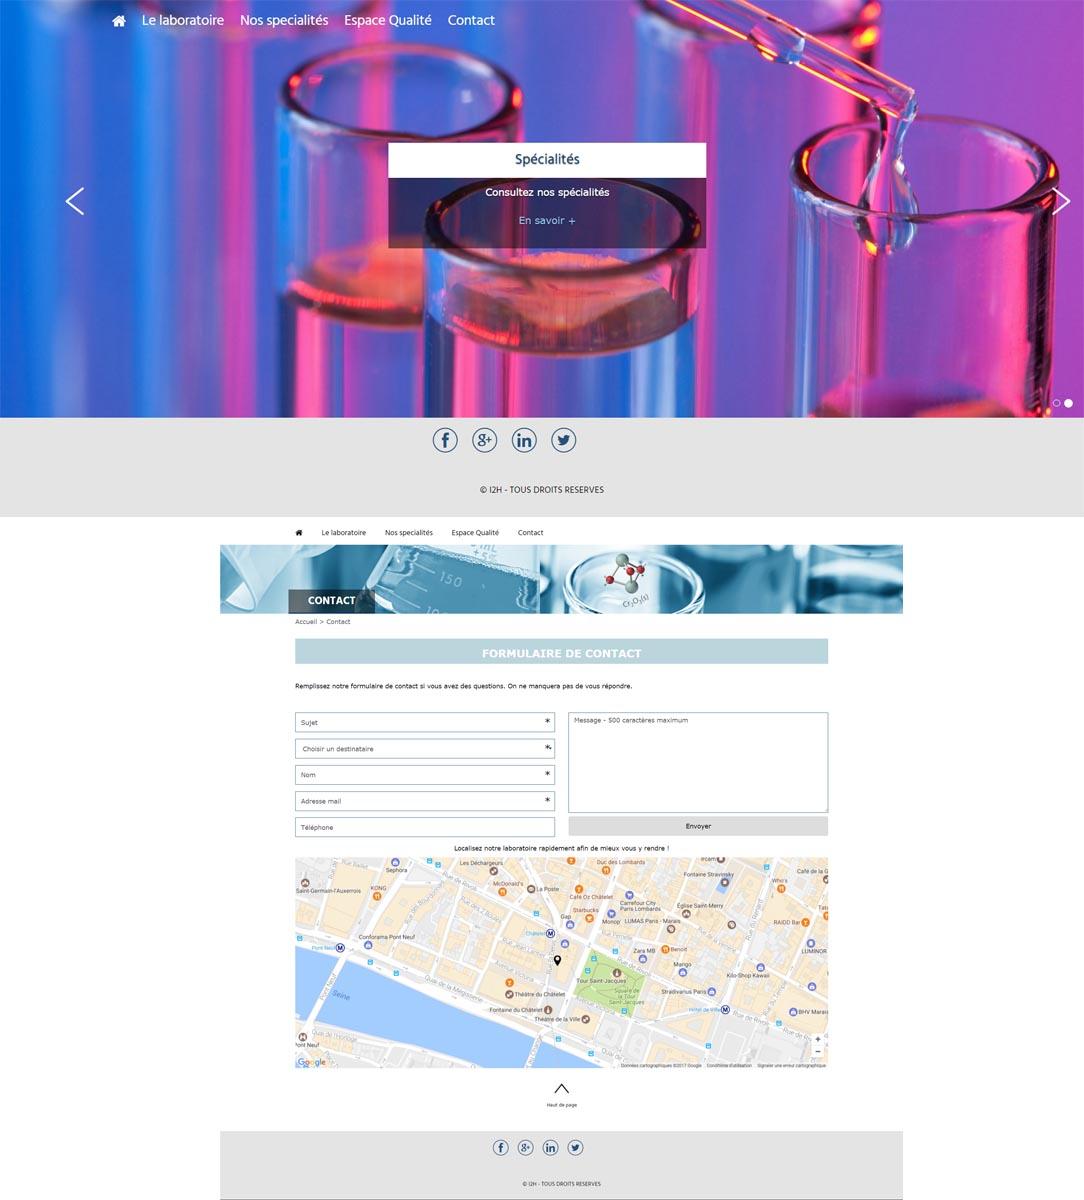 template laboratoire d'analyse